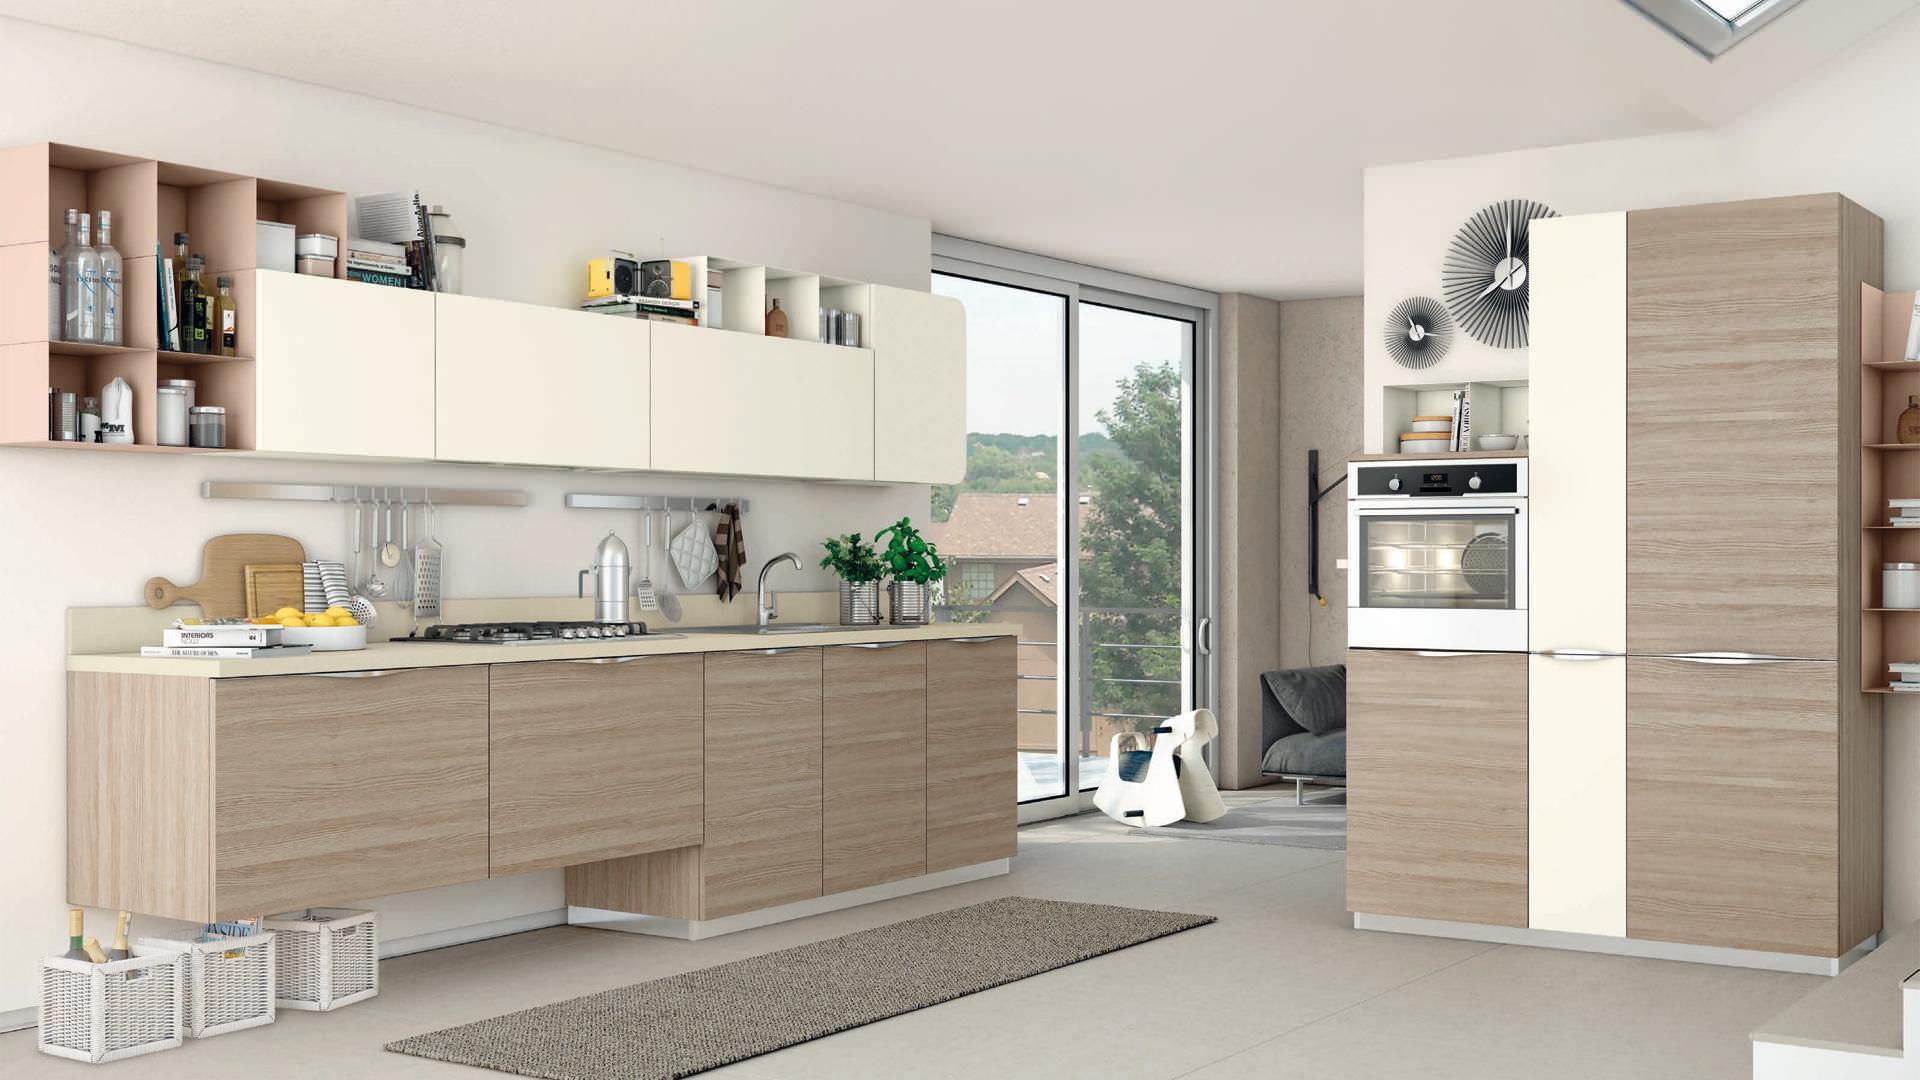 cucina moderna impiallacciata in legno immagina